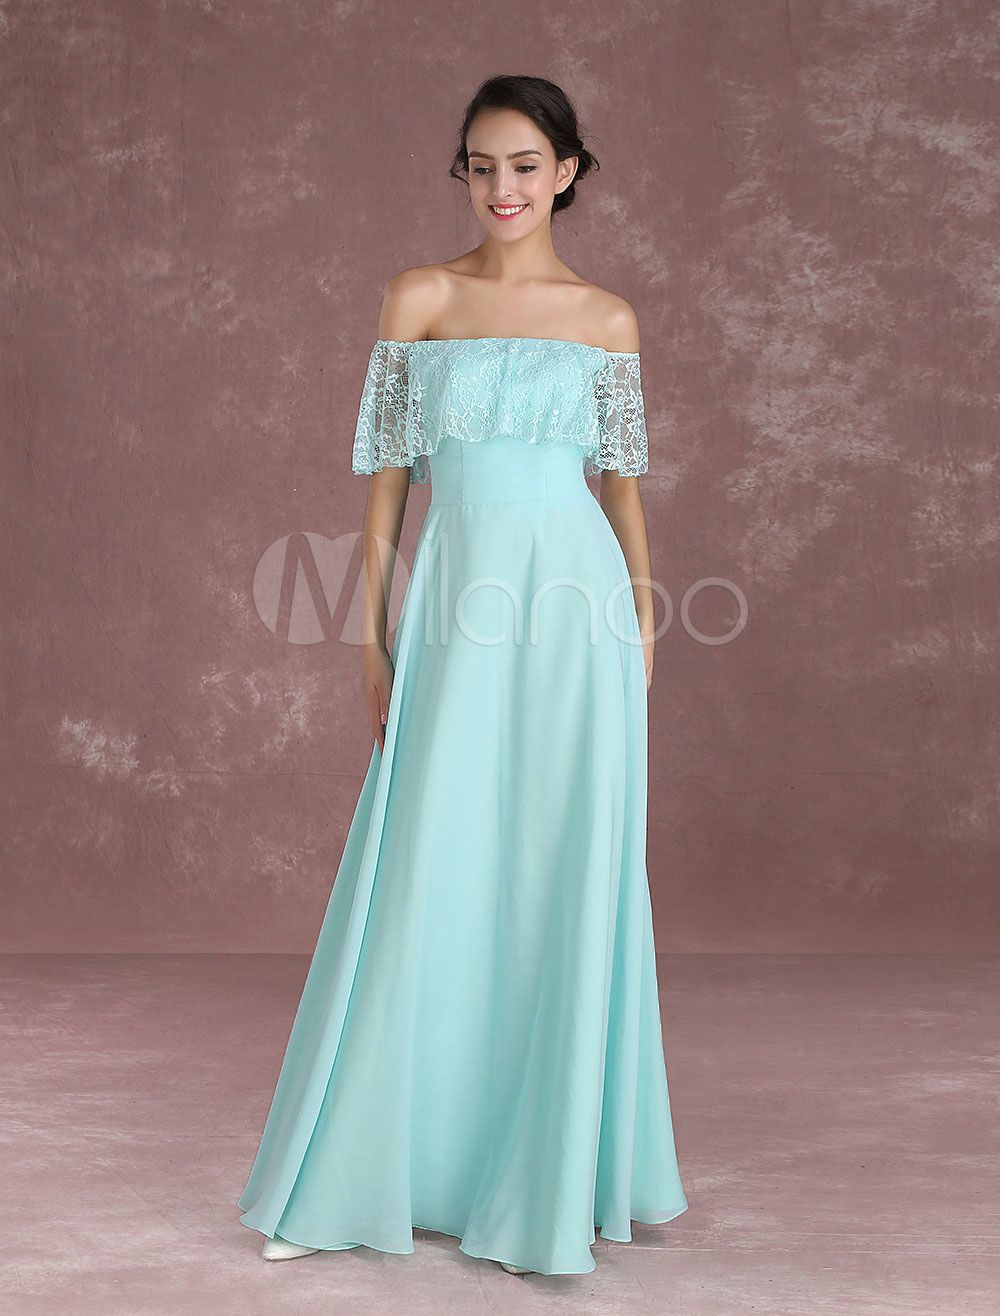 4f2e80cd903 Long Prom Dresses 2018 Off The Shoulder Prom Dress Mint Green Lace Chiffon  Floor Length Evening Dress  Shoulder